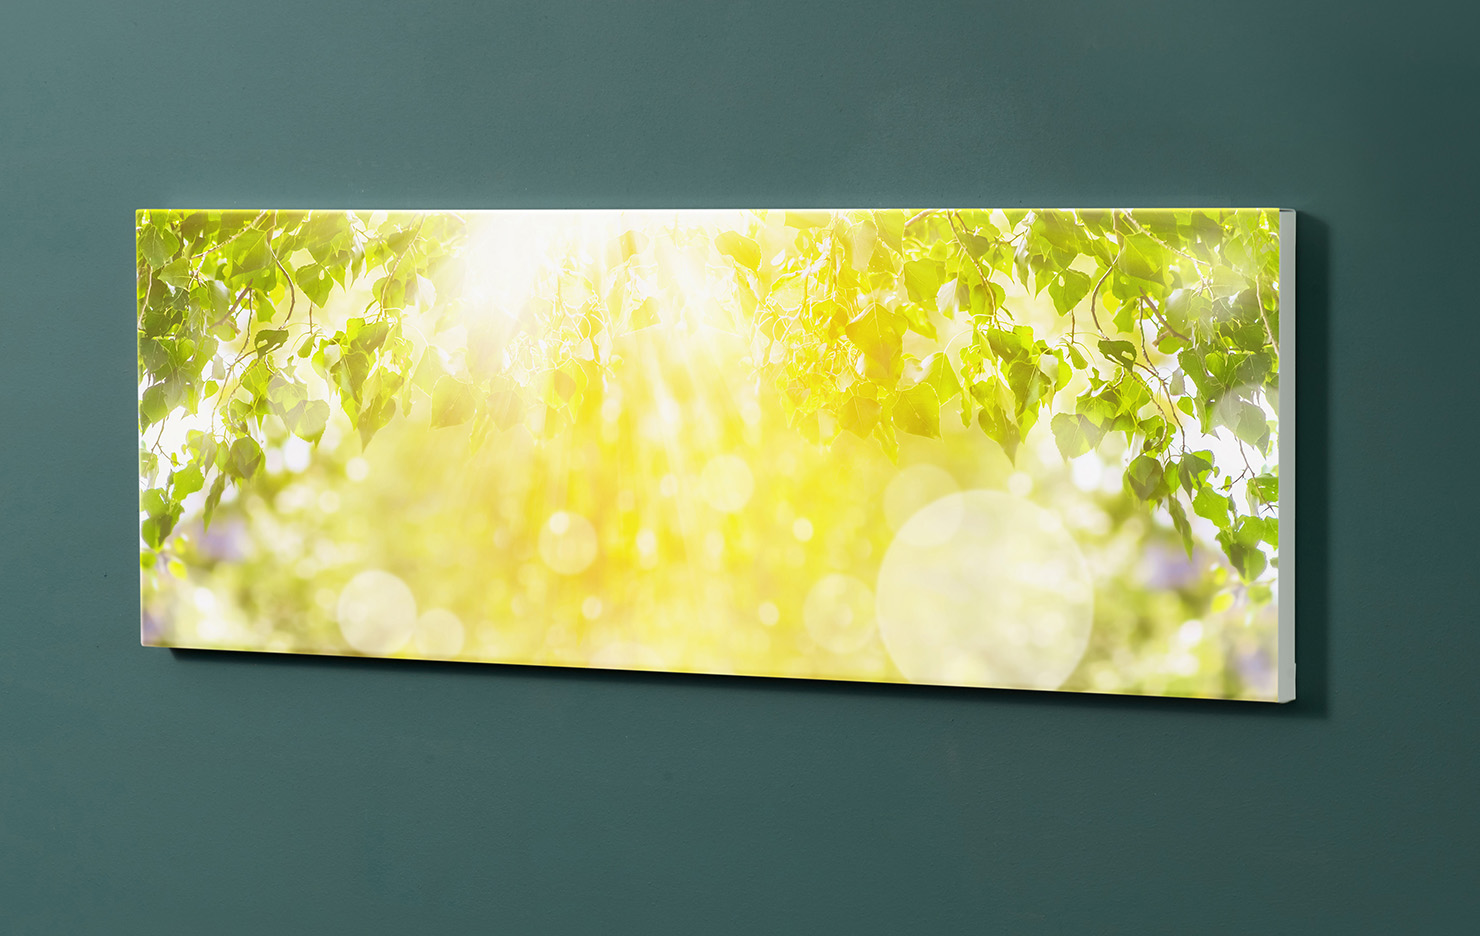 Magnettafel NOTIZ 90x30cm Motiv-Pinnwand M120 Bäume